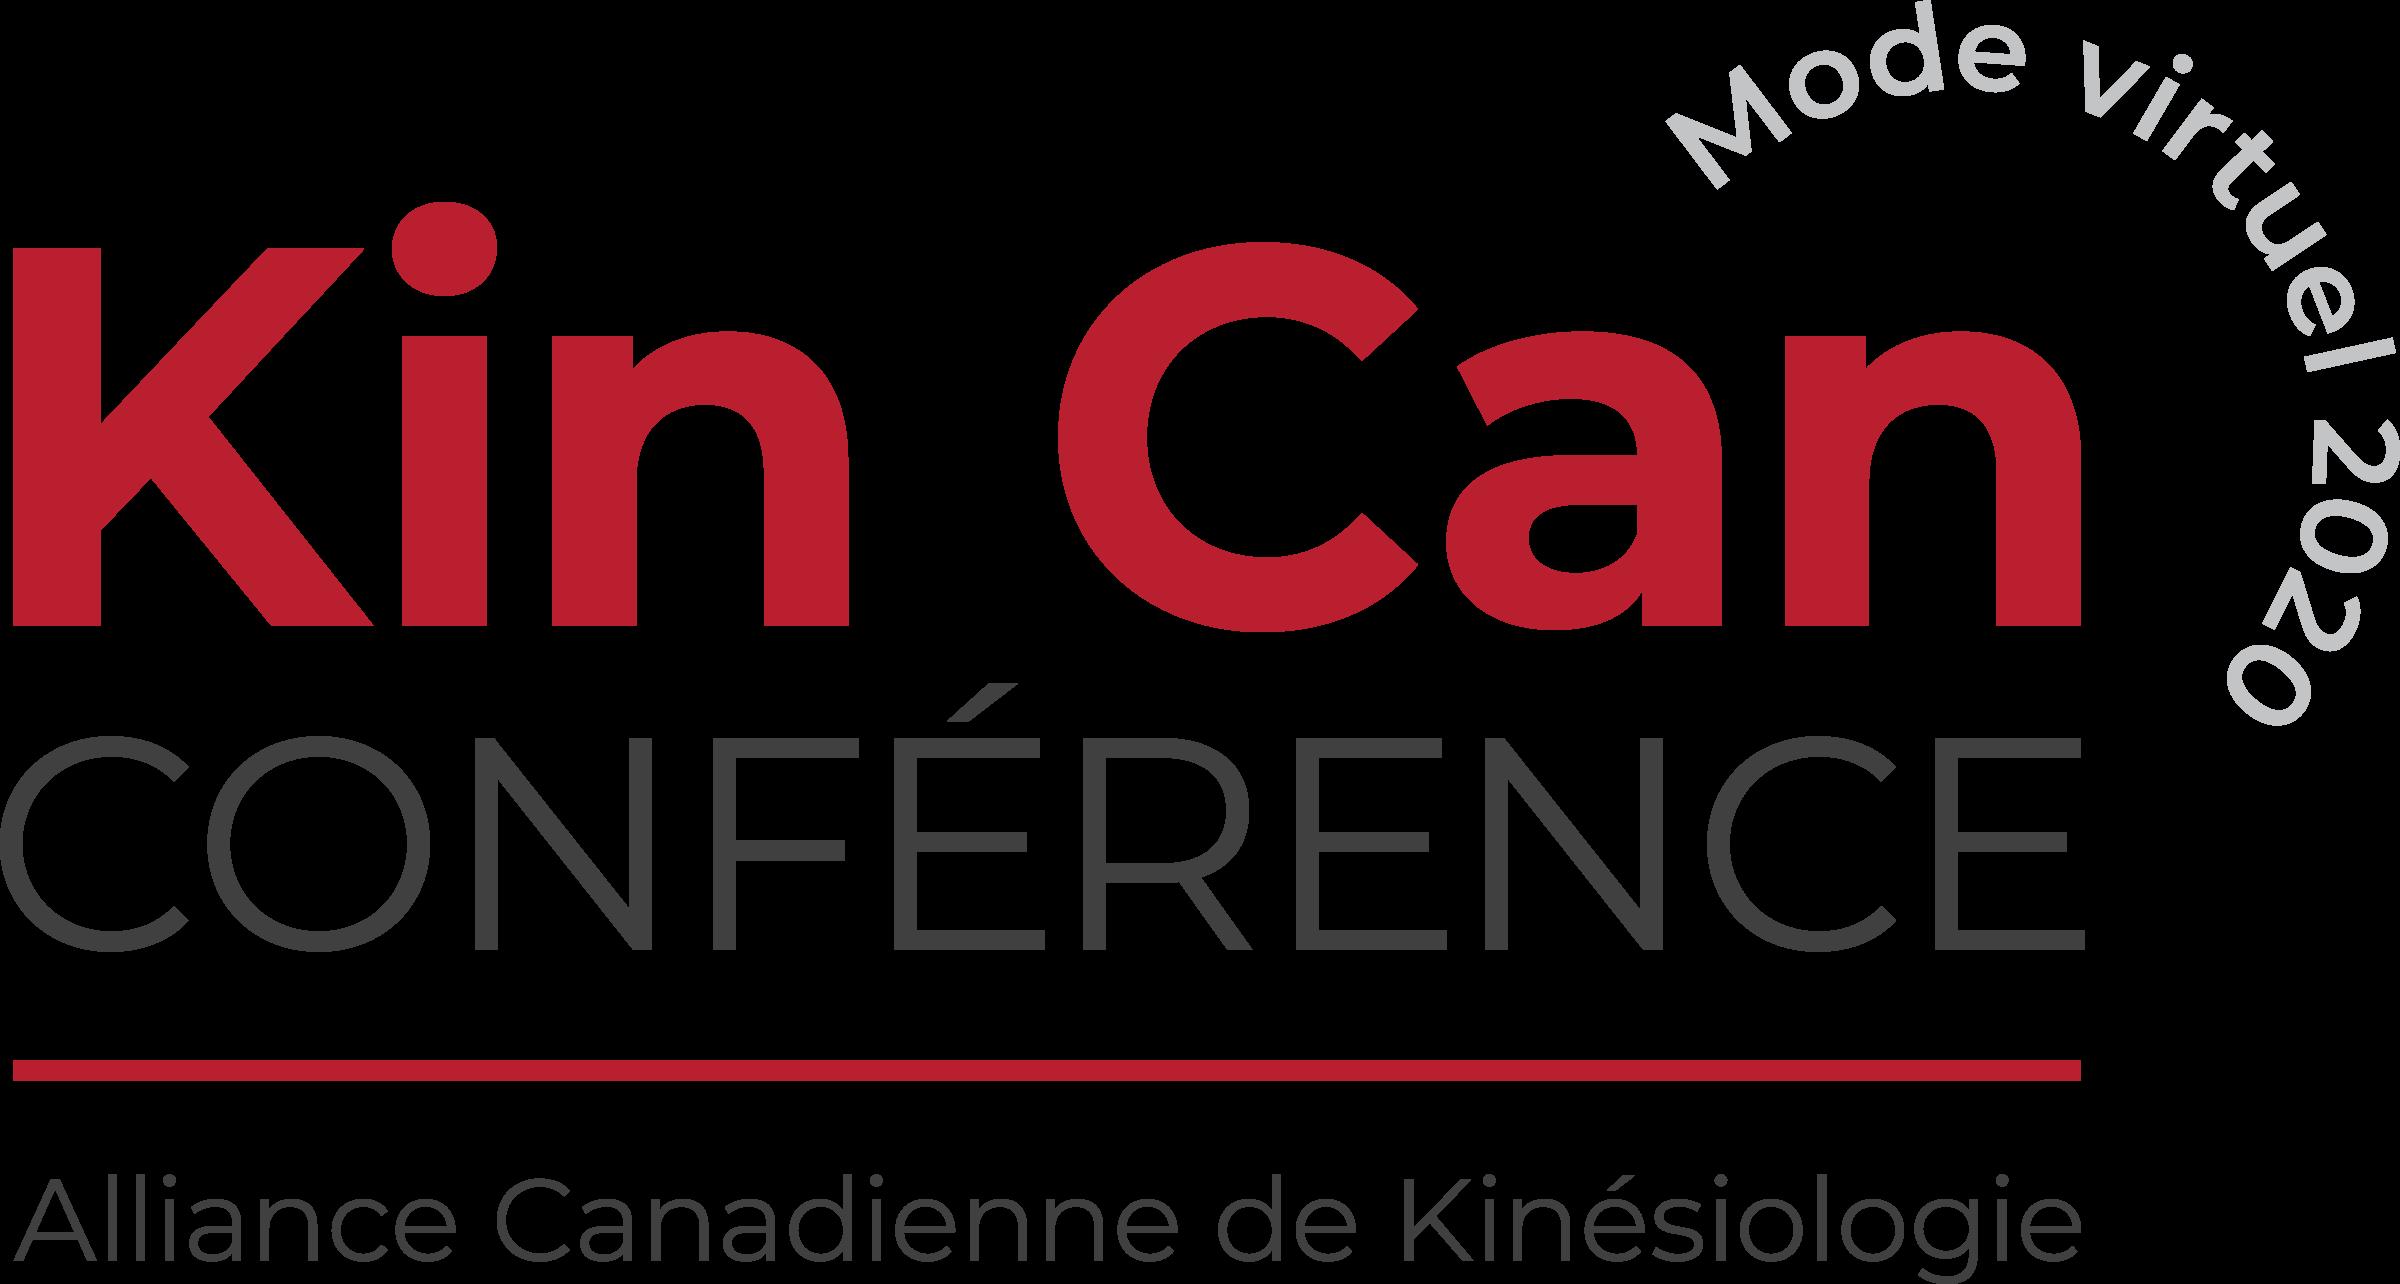 Conférence virtuelle nationale de kinésiologie